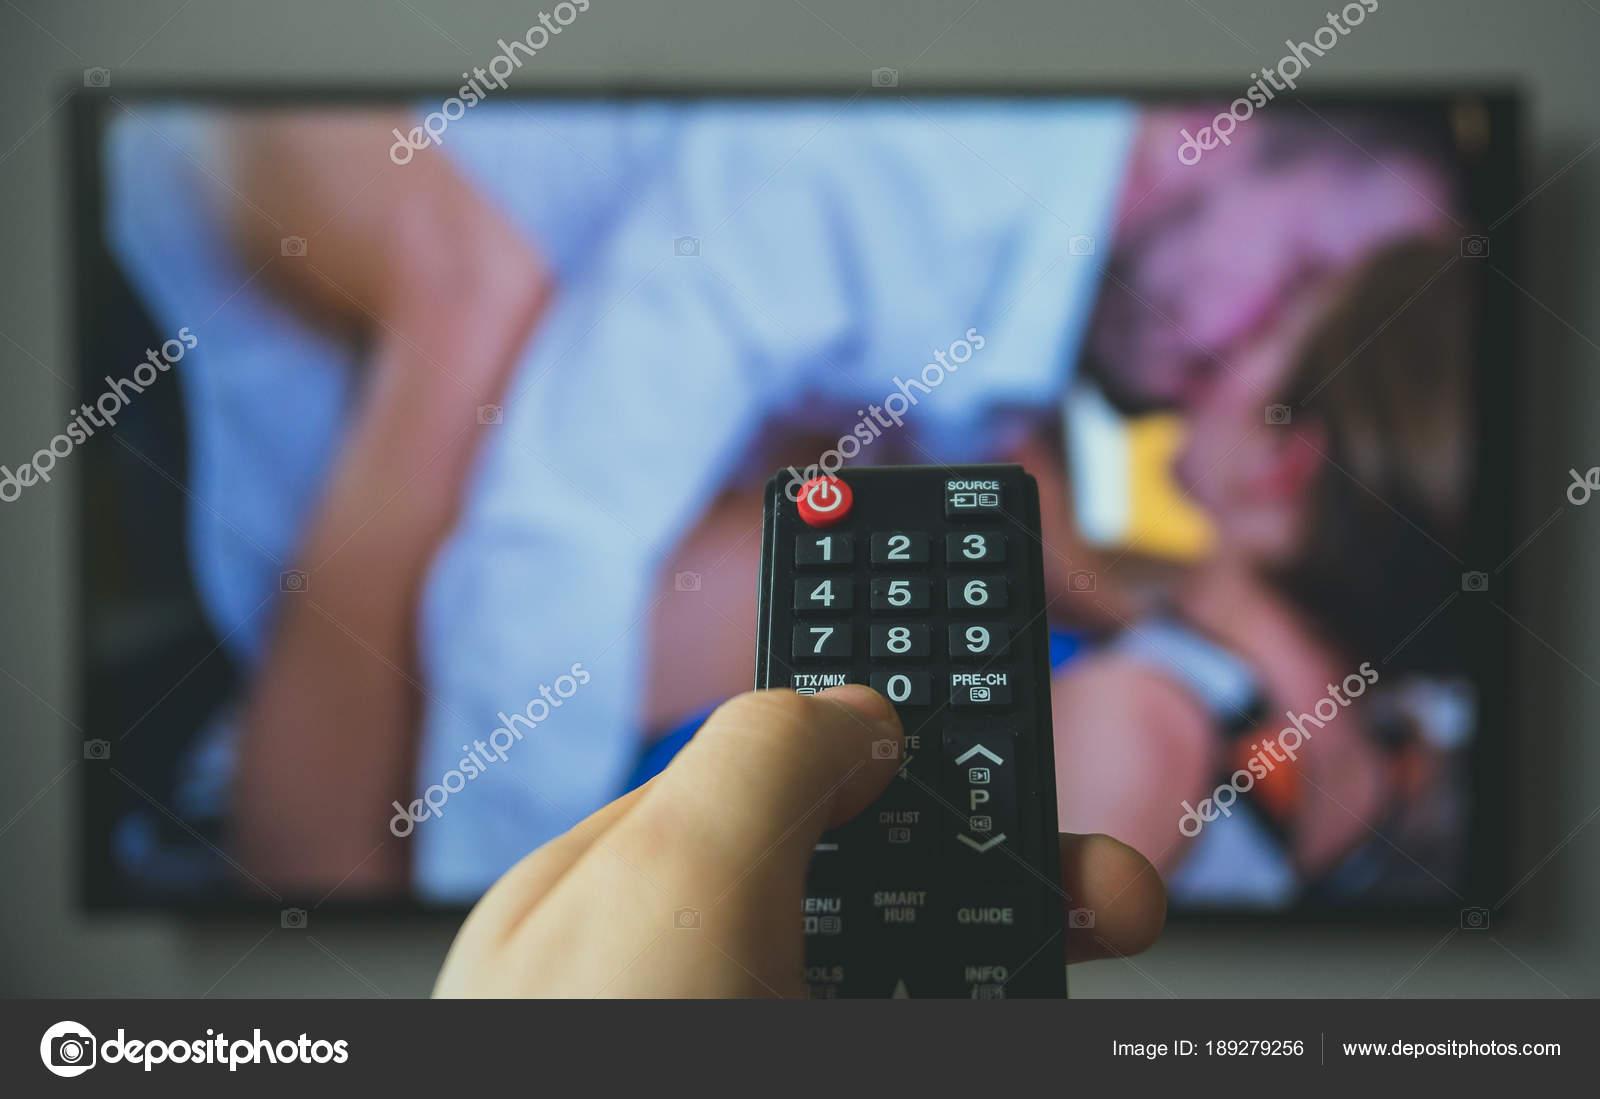 OTTCLUB Онлайн тв  Интернет телевидение  Смотреть